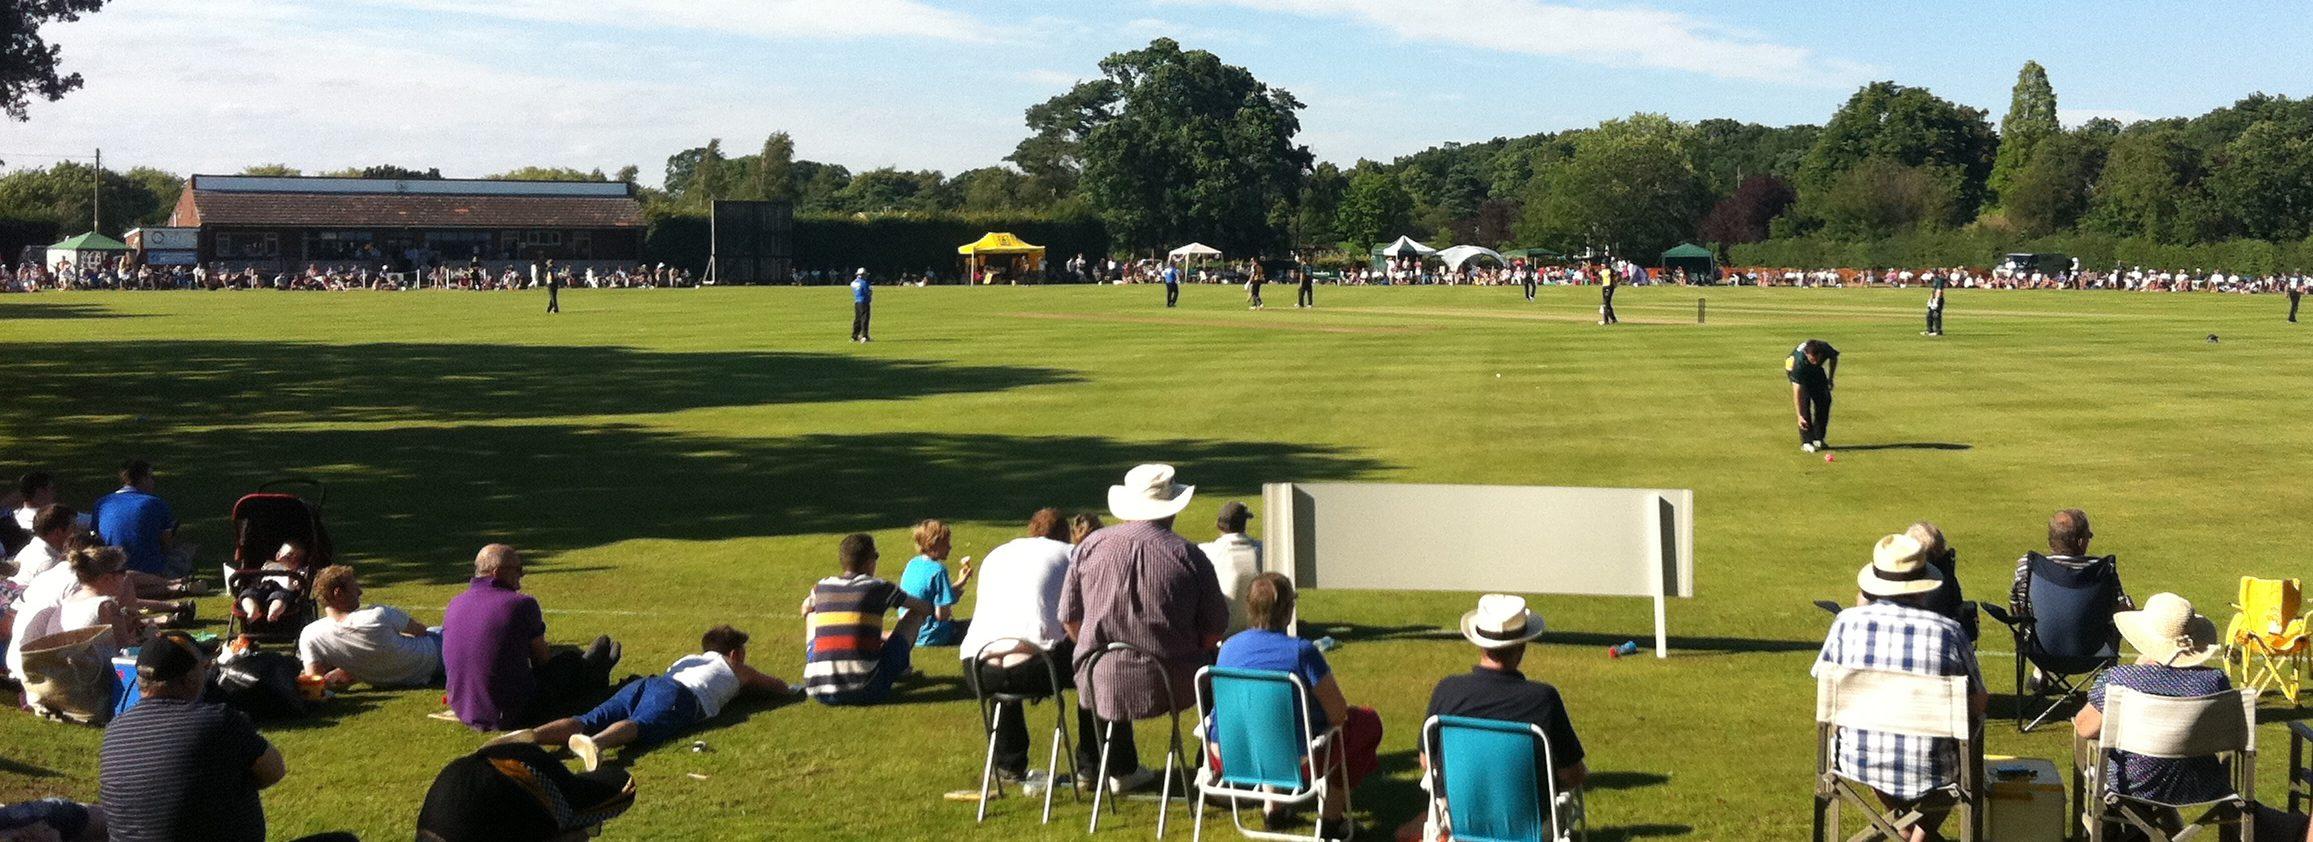 Home | World Cricket Centre